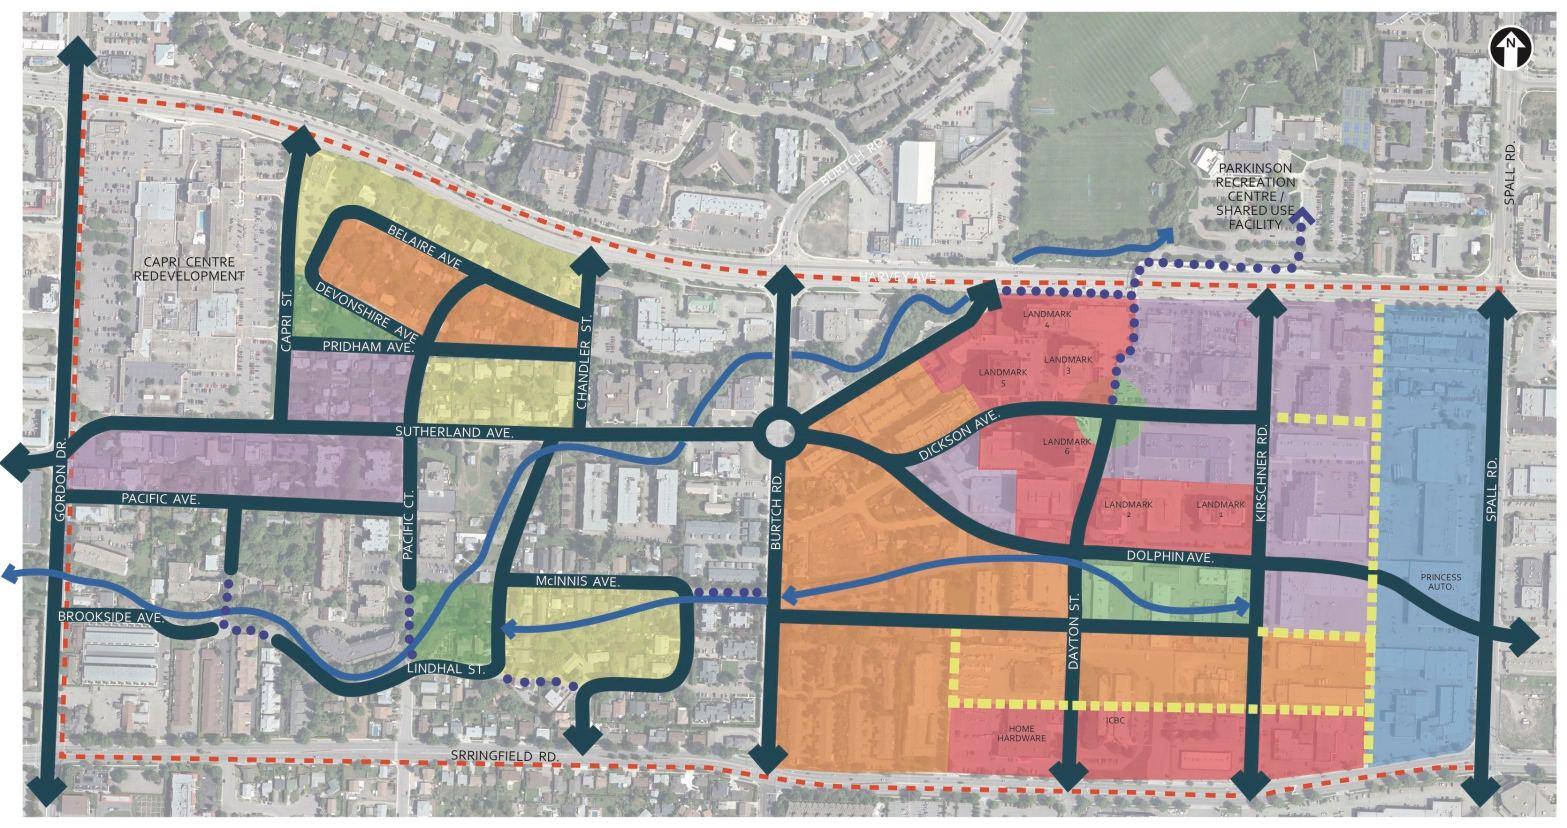 land use map concept for Capri-Landmark area